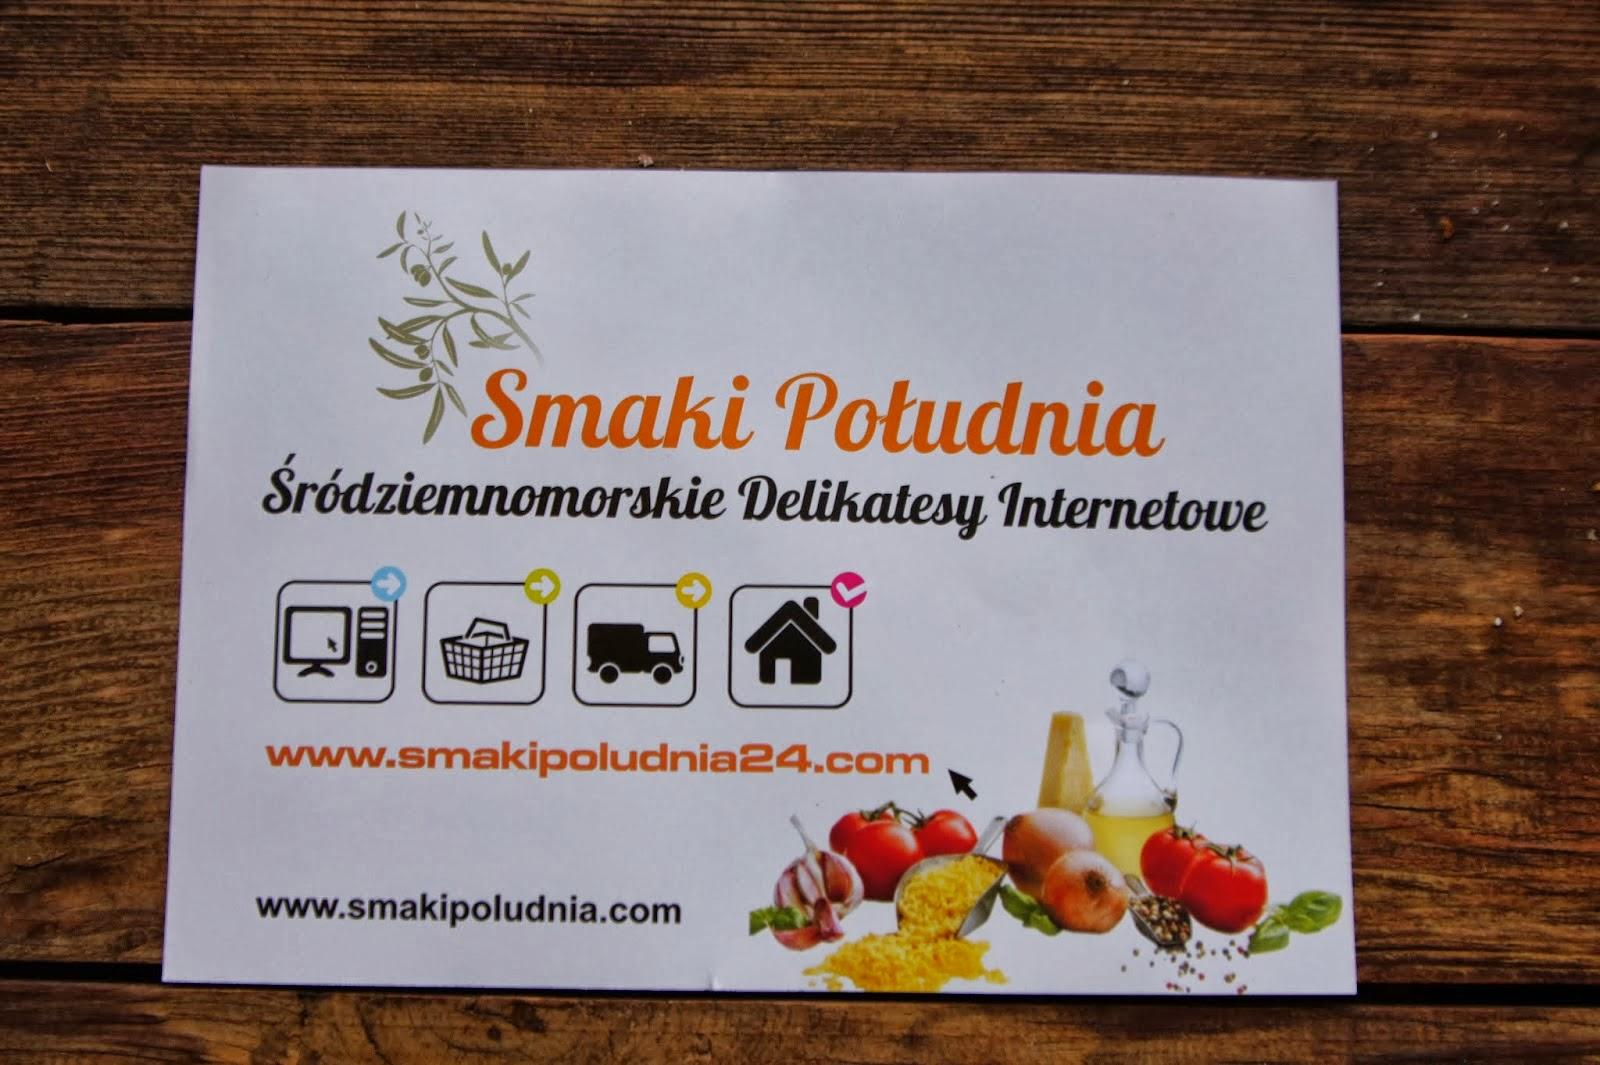 http://smakipoludnia24.pl/product/664/sacla-zielone-oliwki-bez-pestek-185g.html